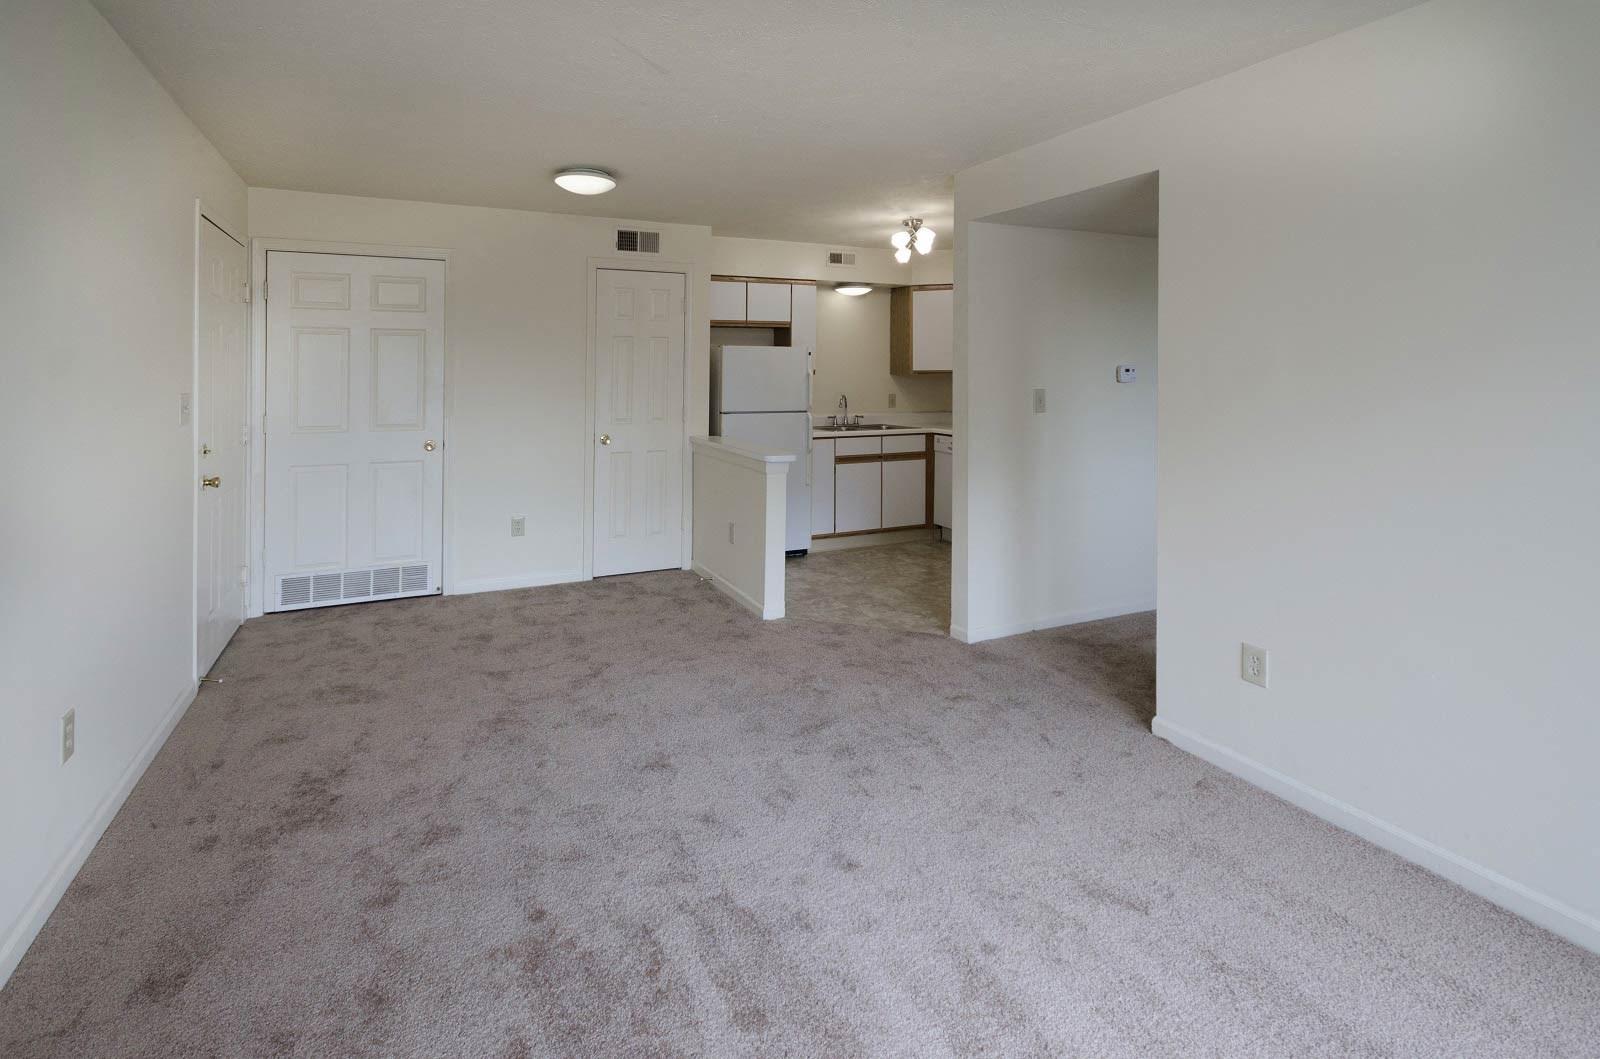 Bradford Place Apartments, Lafayette, Indiana